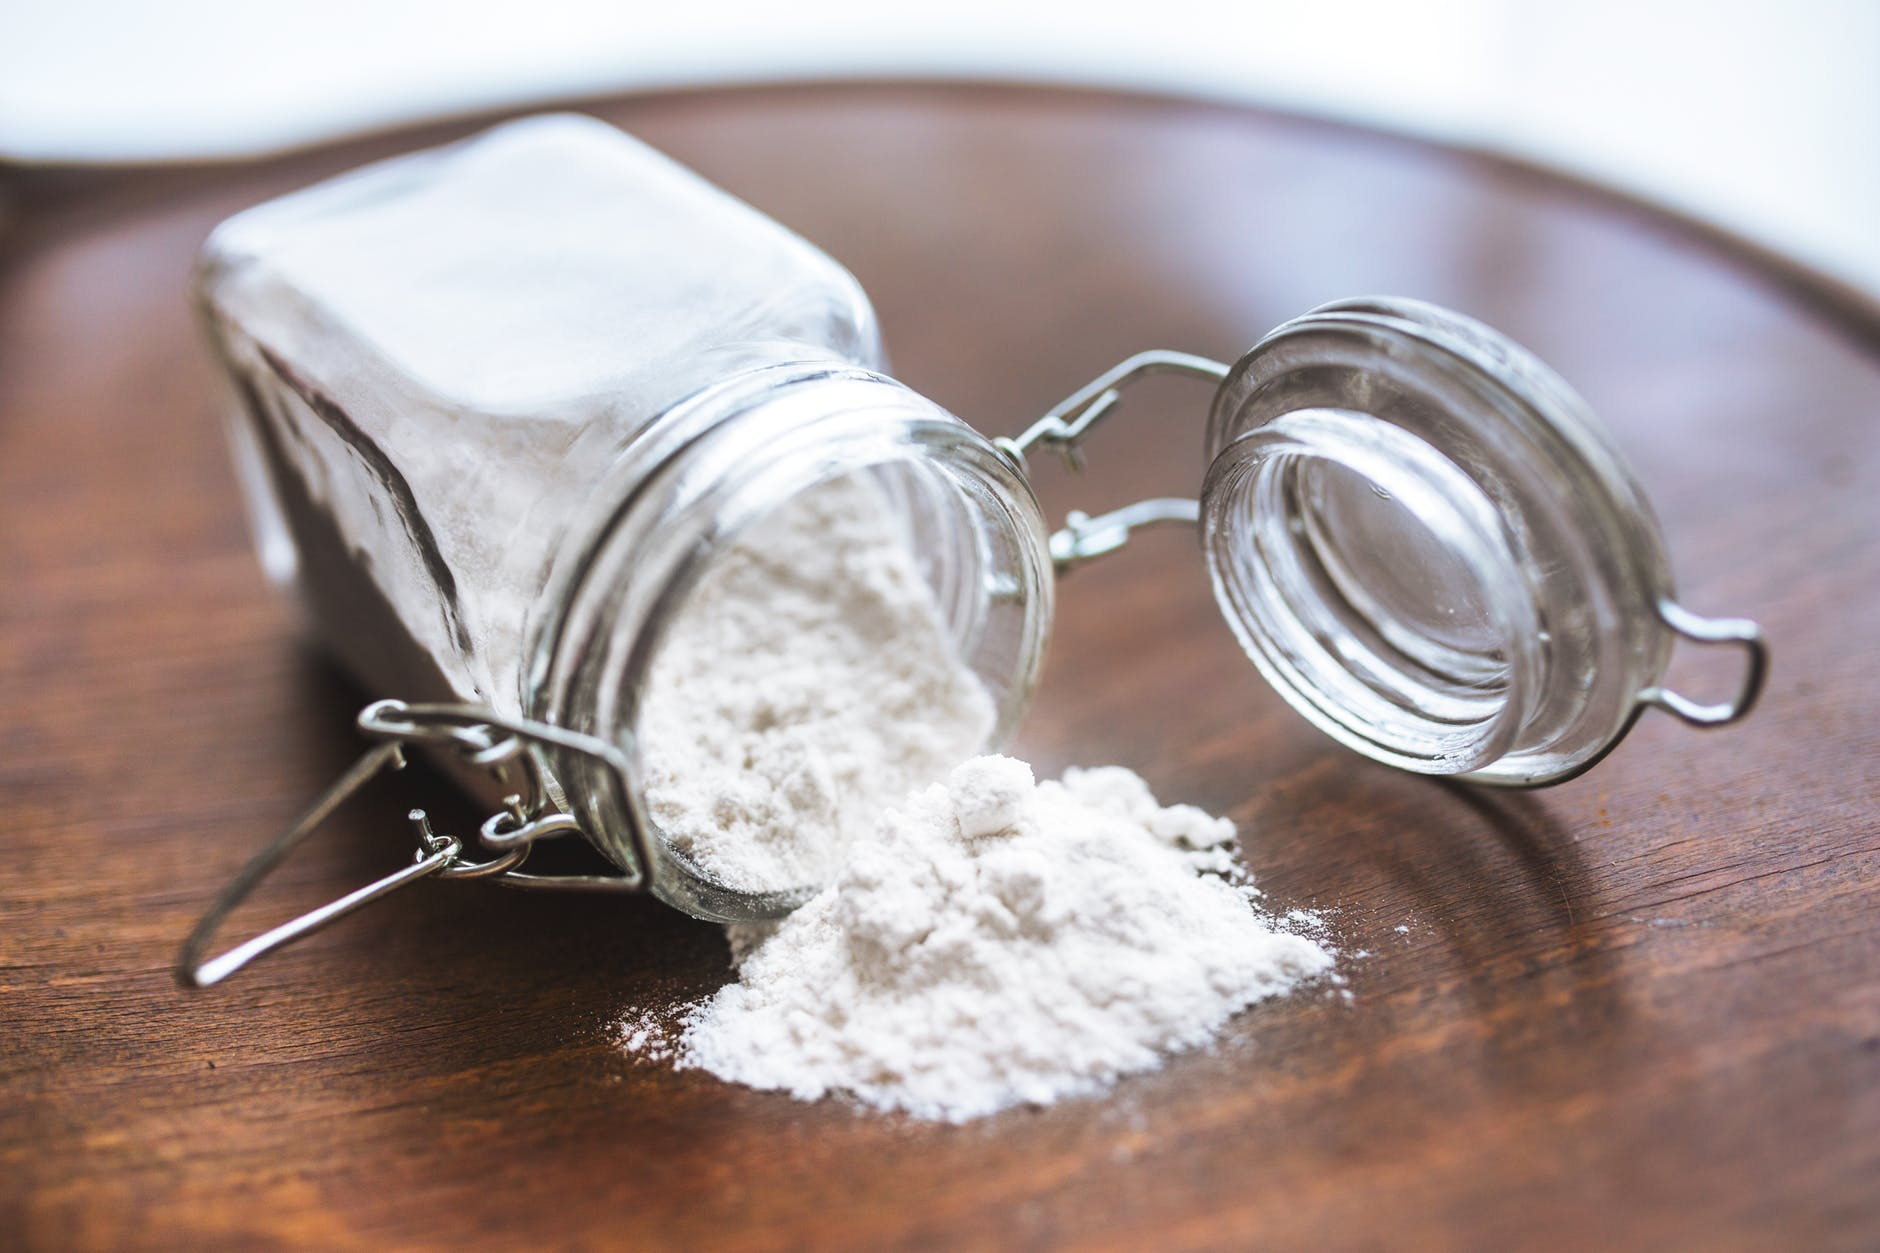 Use corn starch instead of talcum powder